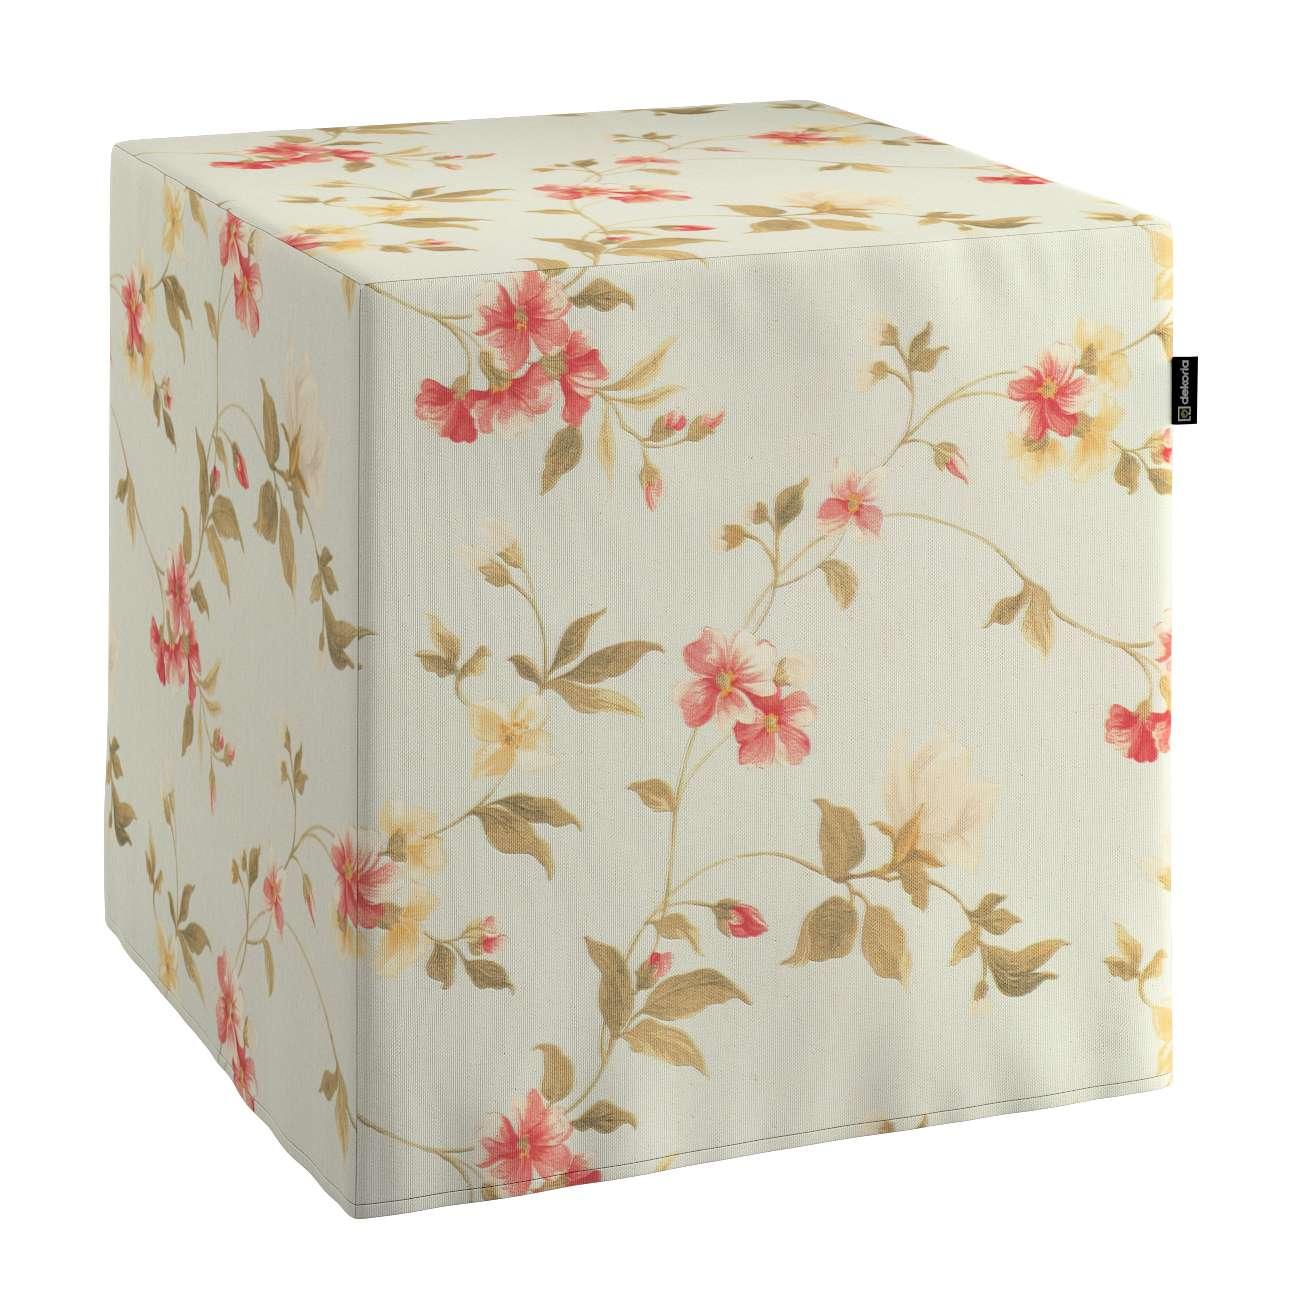 Sedák Cube - kostka pevná 40x40x40 v kolekci Londres, látka: 124-65